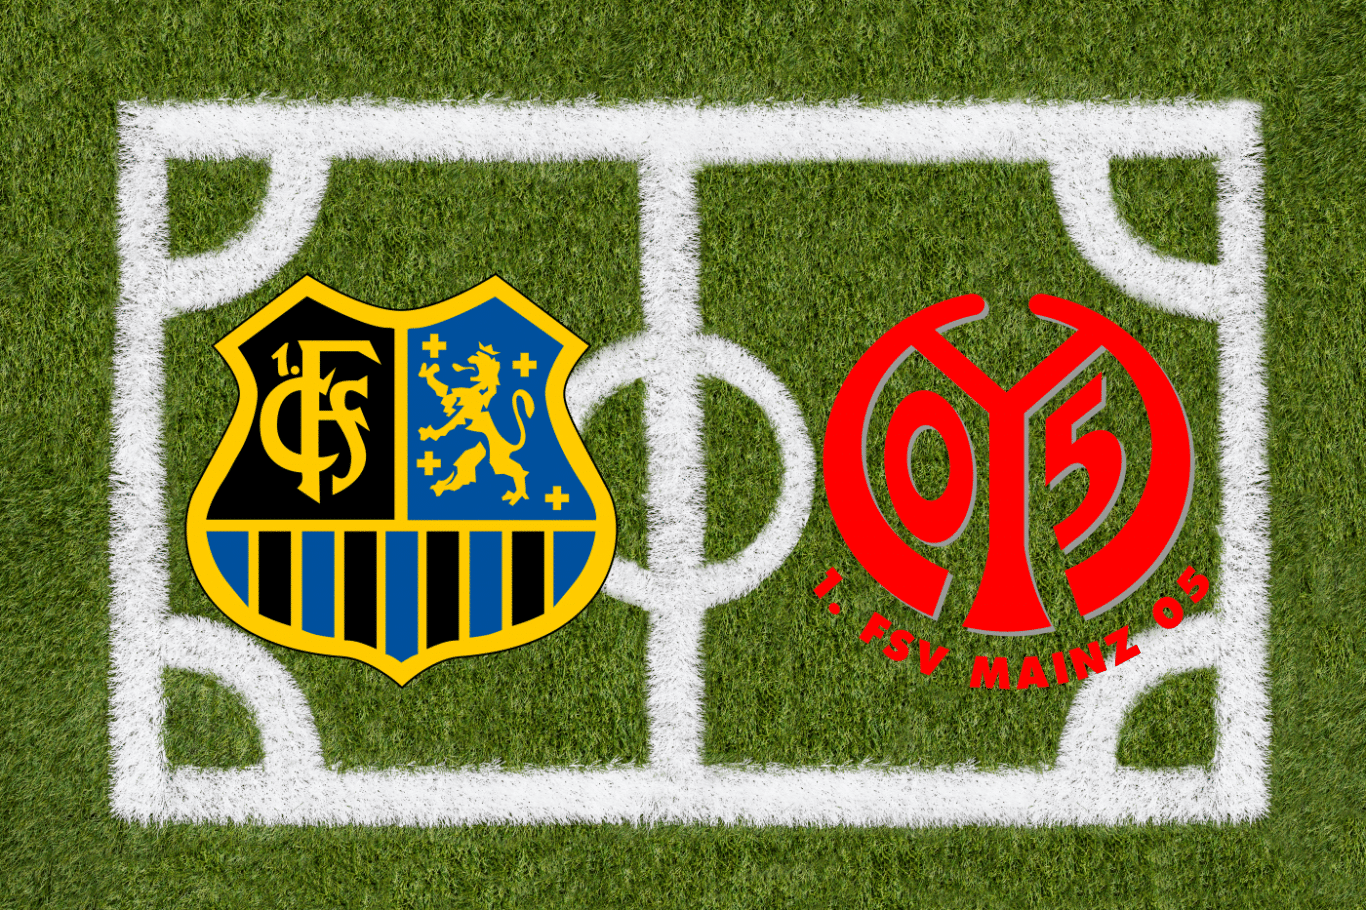 FCS Mainz 05